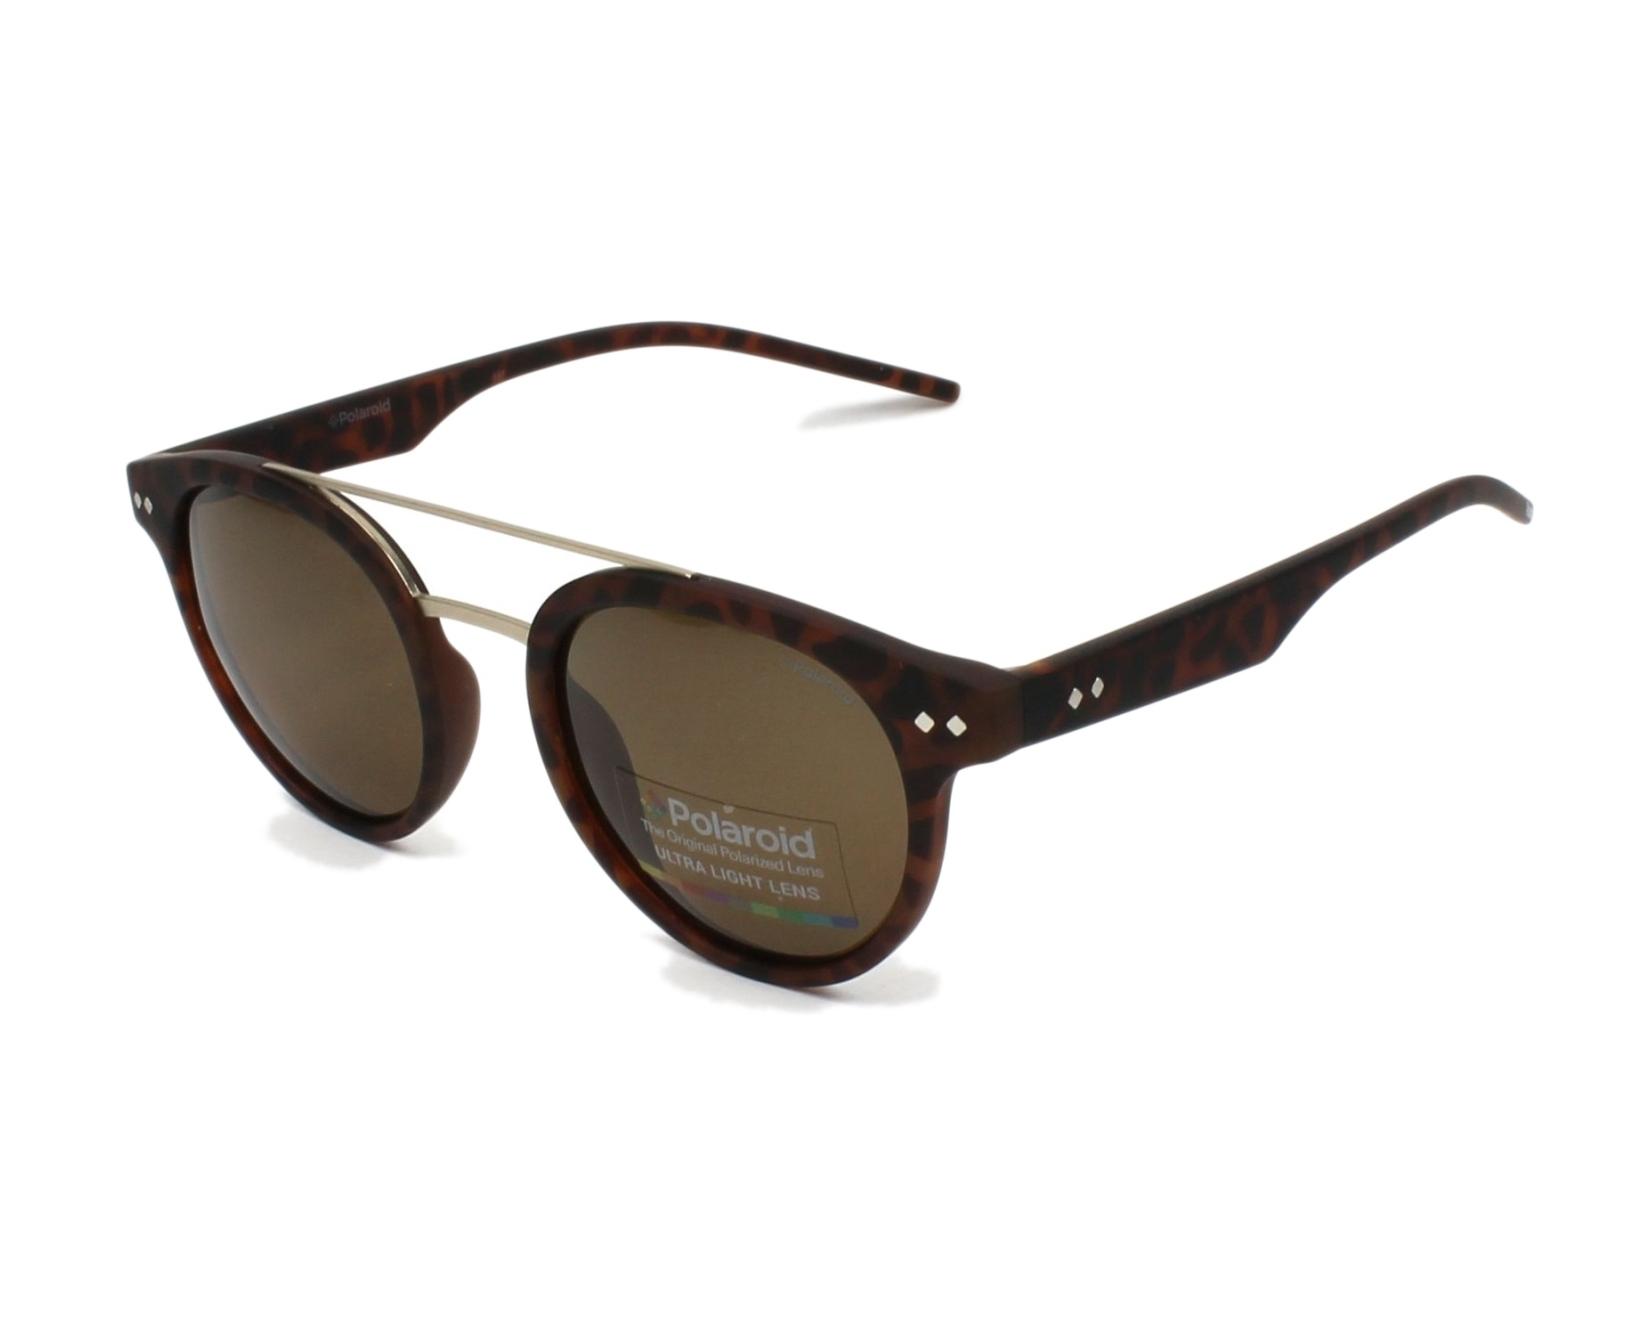 aee90134136a5d Sunglasses Polaroid PLD-6031-S N9P SP 49-21 Havana Gold profile